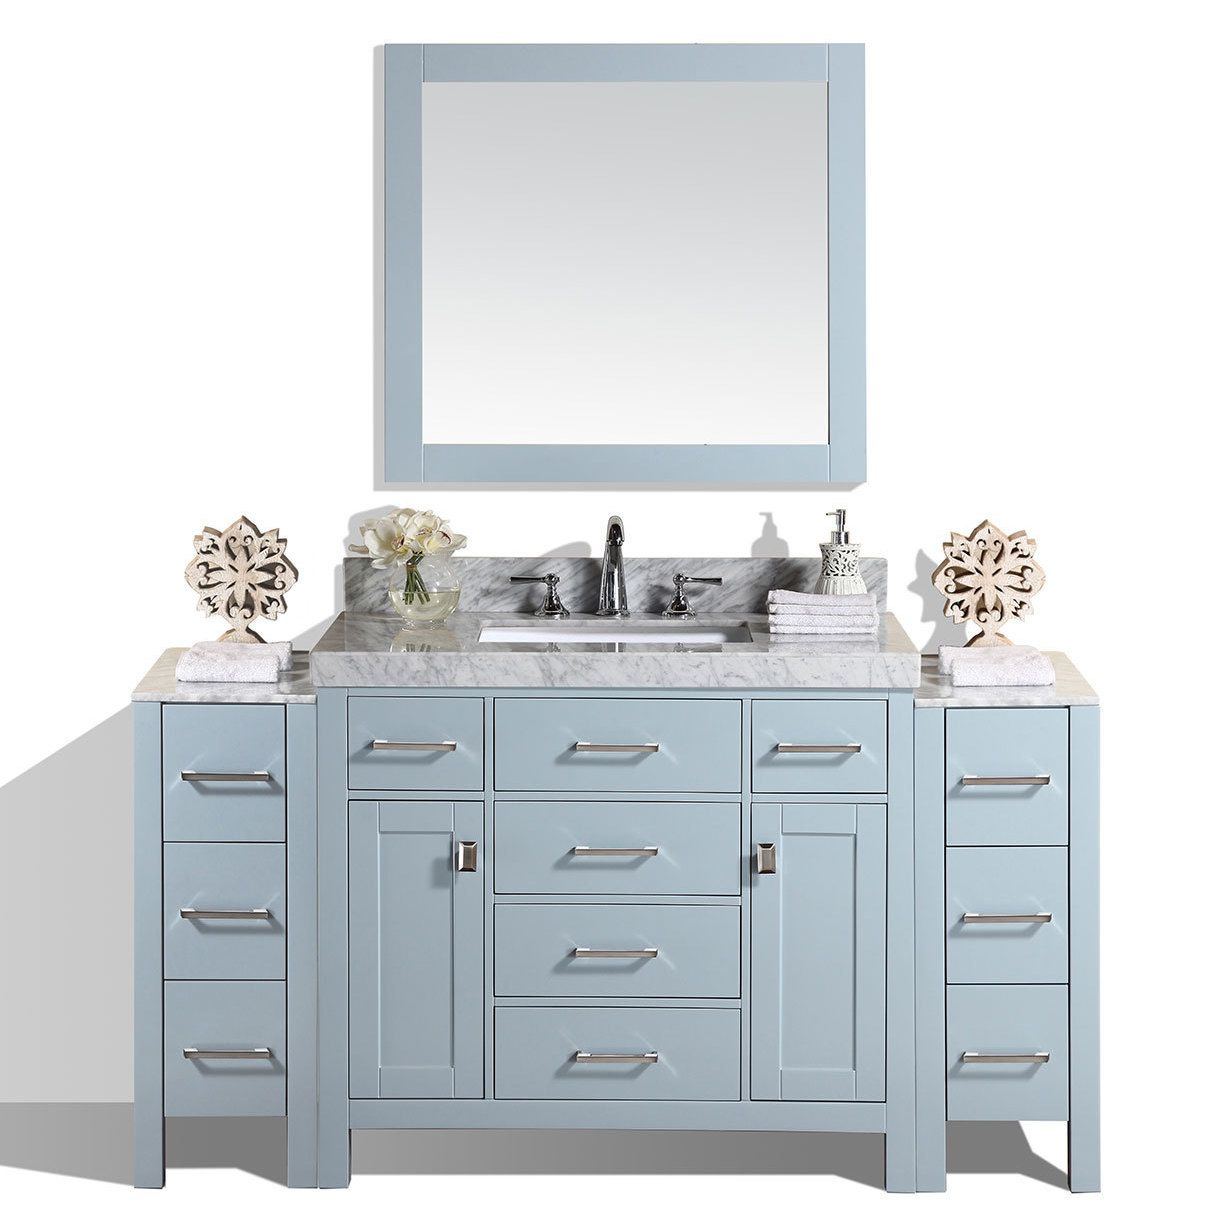 64 Inch Malibu Gray Single Bathroom Vanity With 2 Side Cabinets